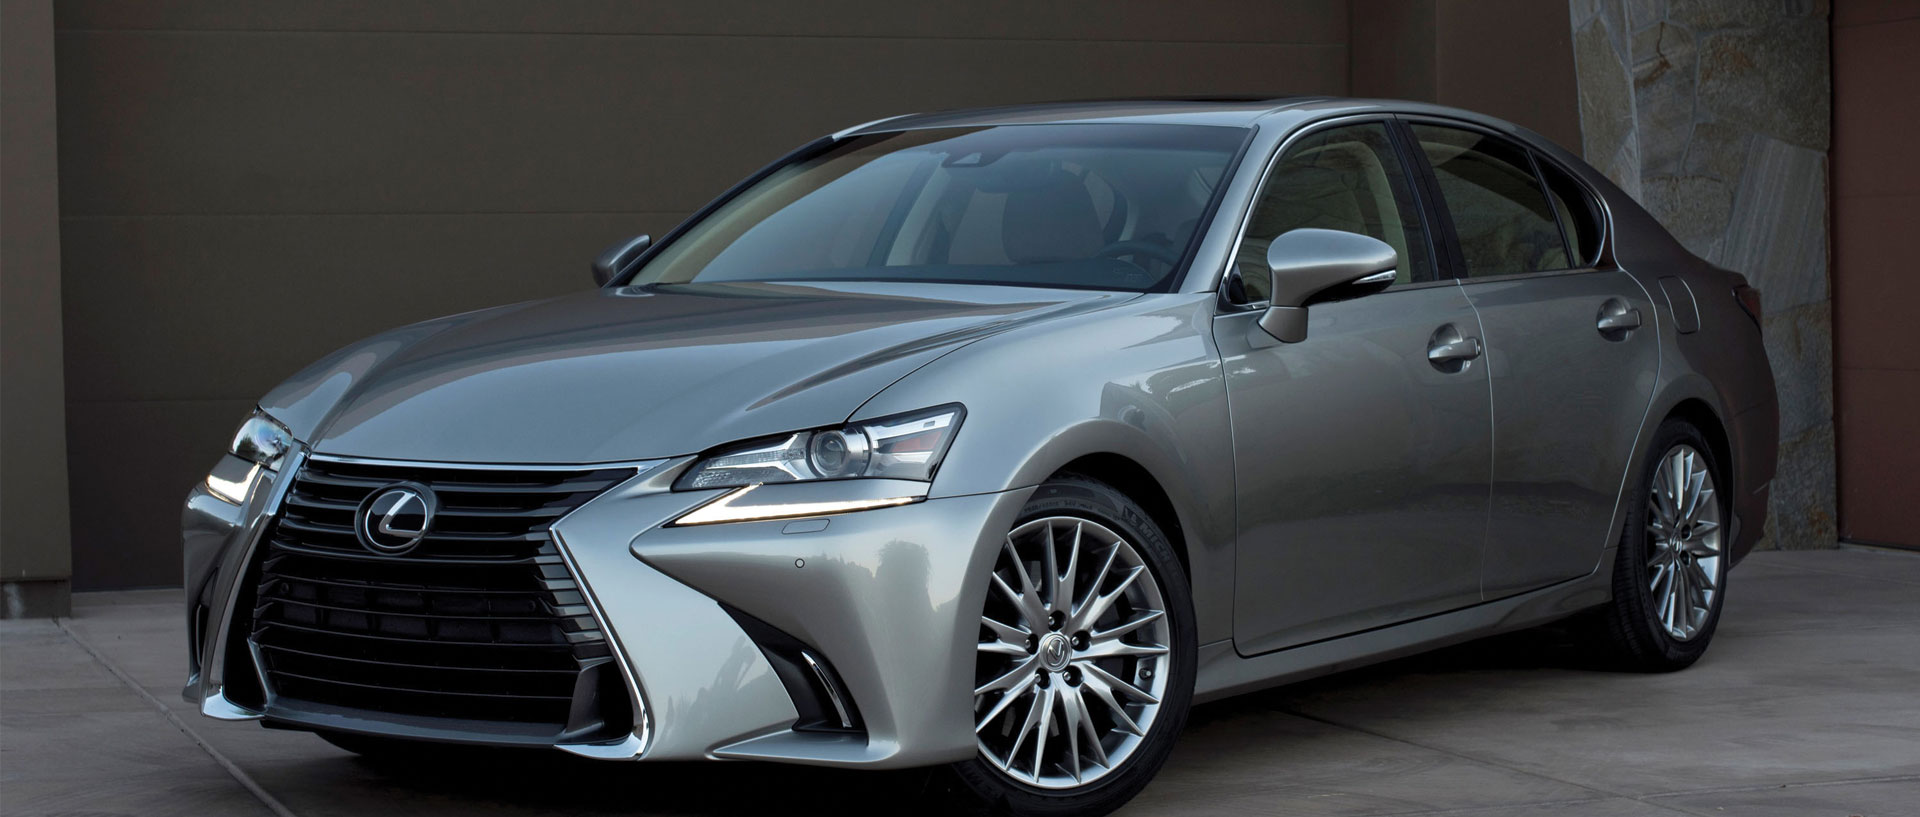 2016 Lexus GS Sedan and LX SUV Get a Makeover